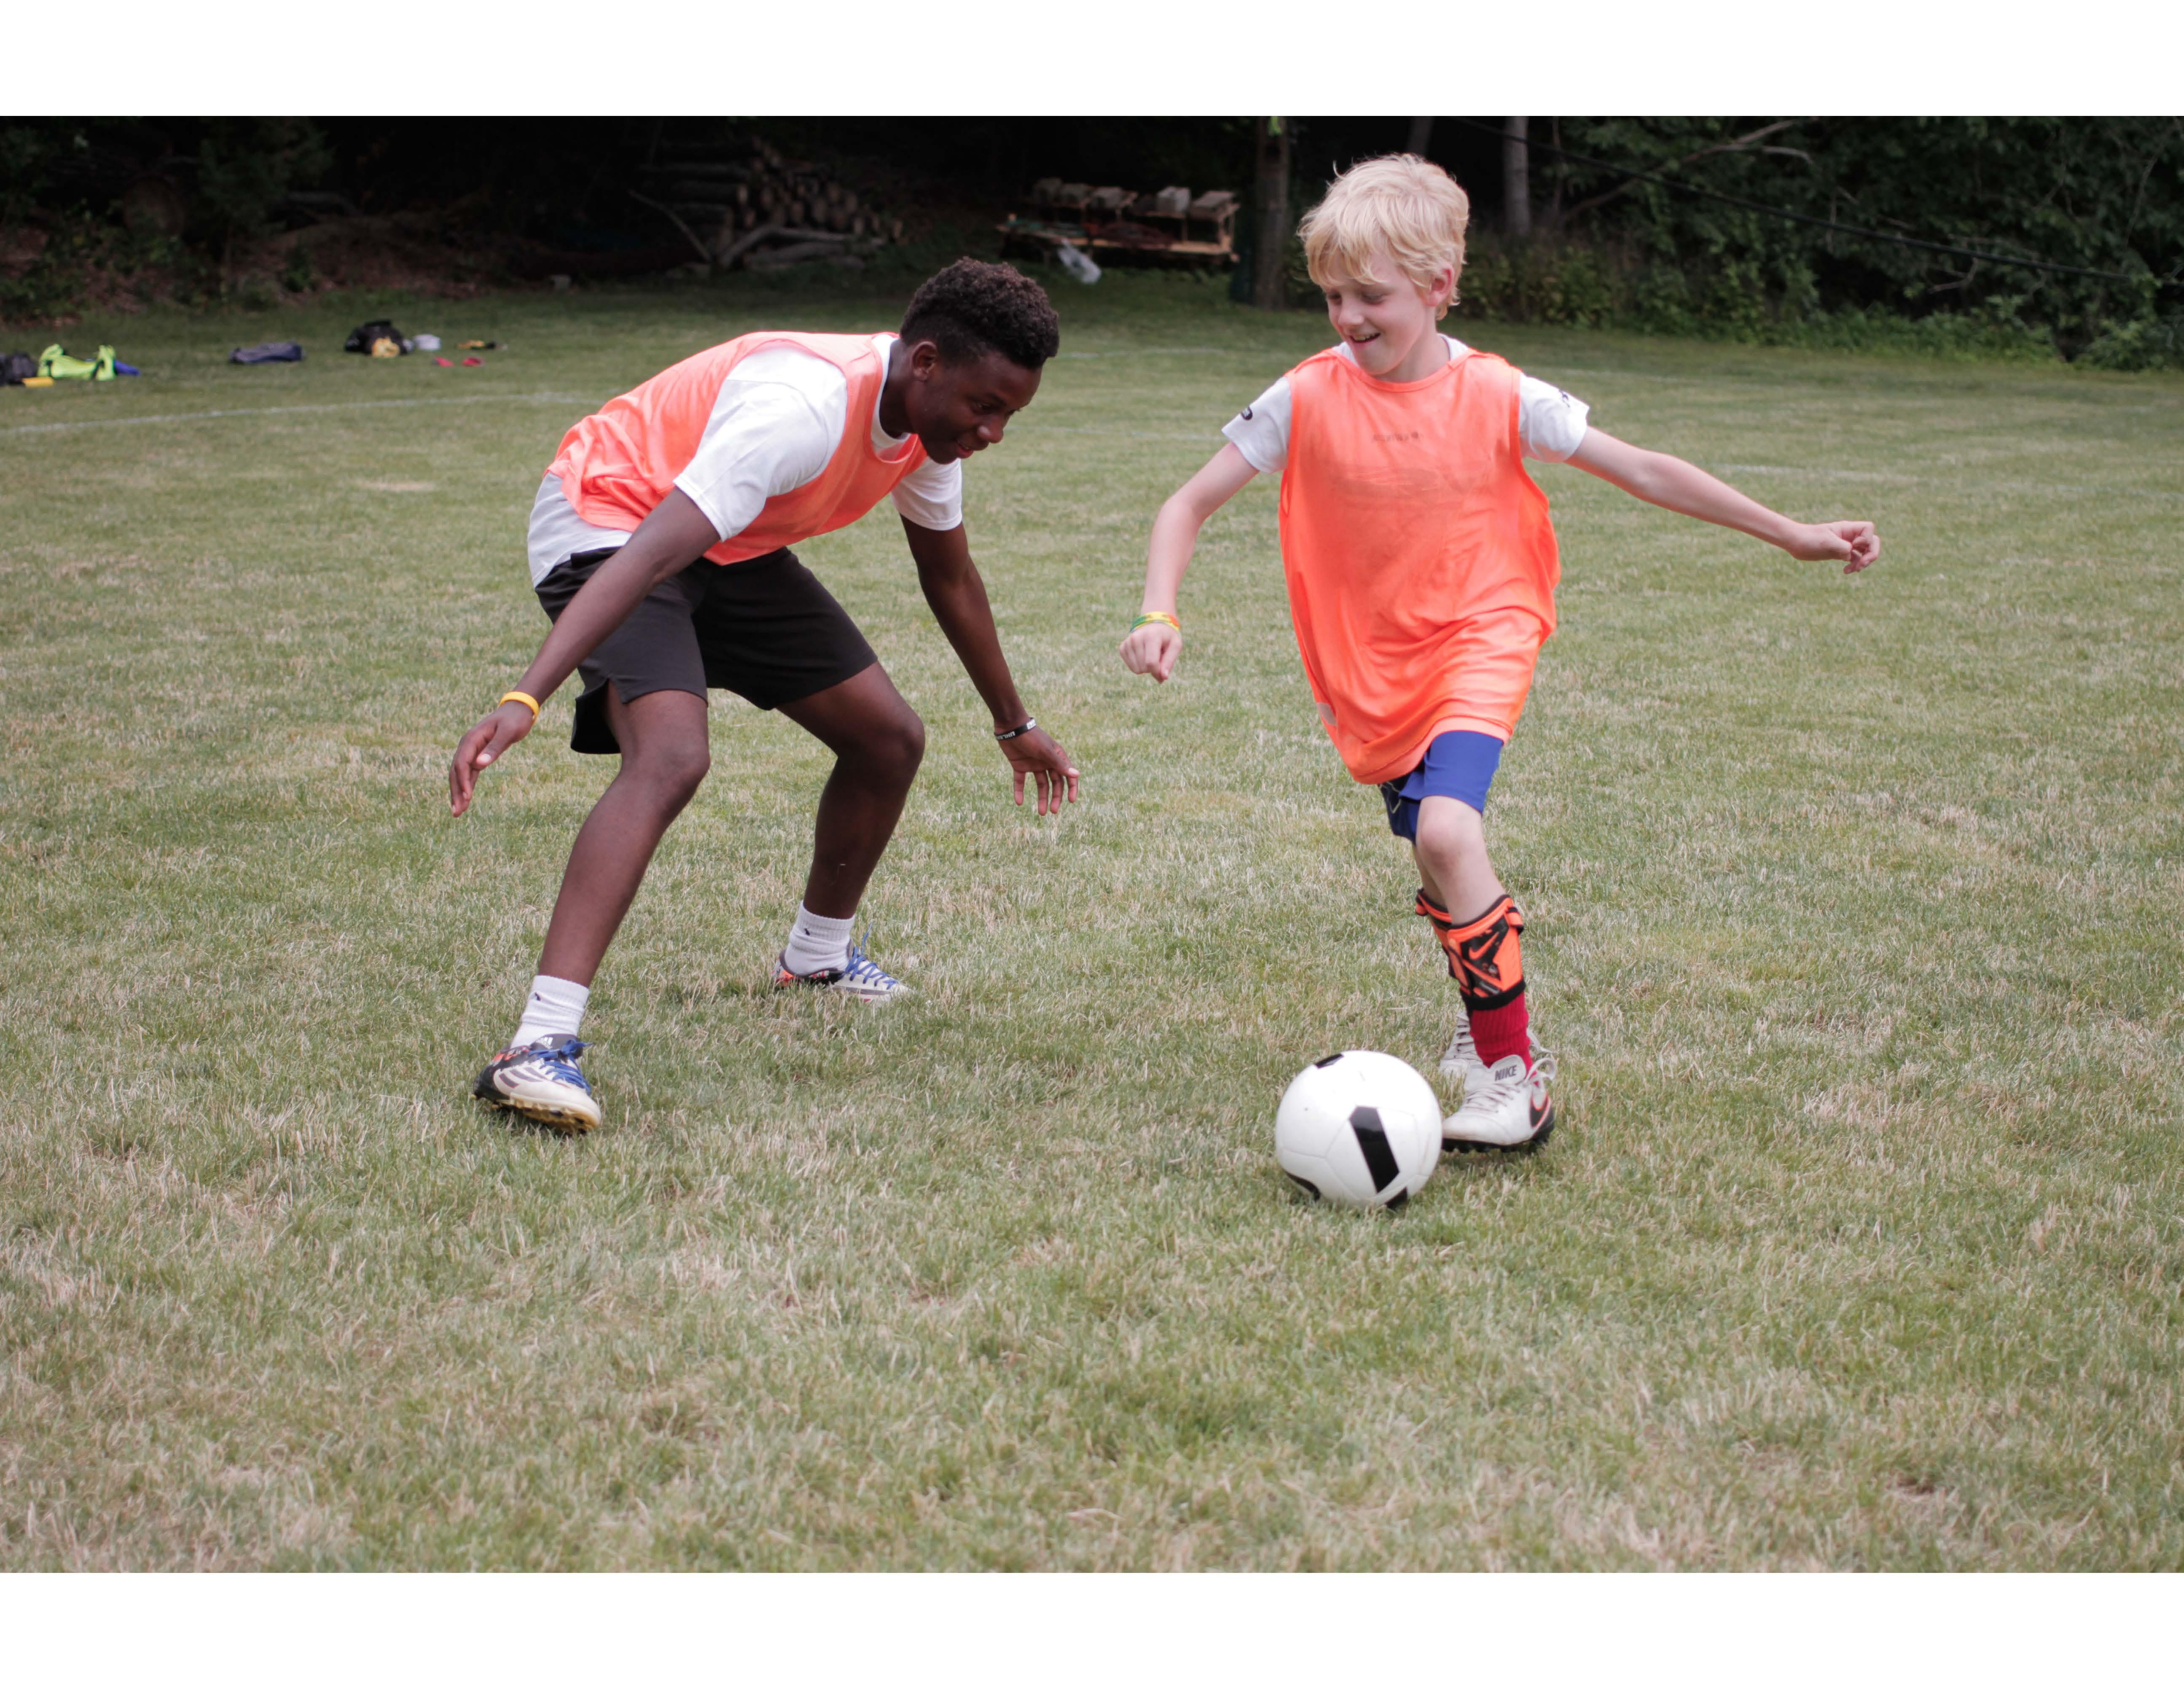 41dbf9c9f Adidas Soccer Programs | MB Sports Camps